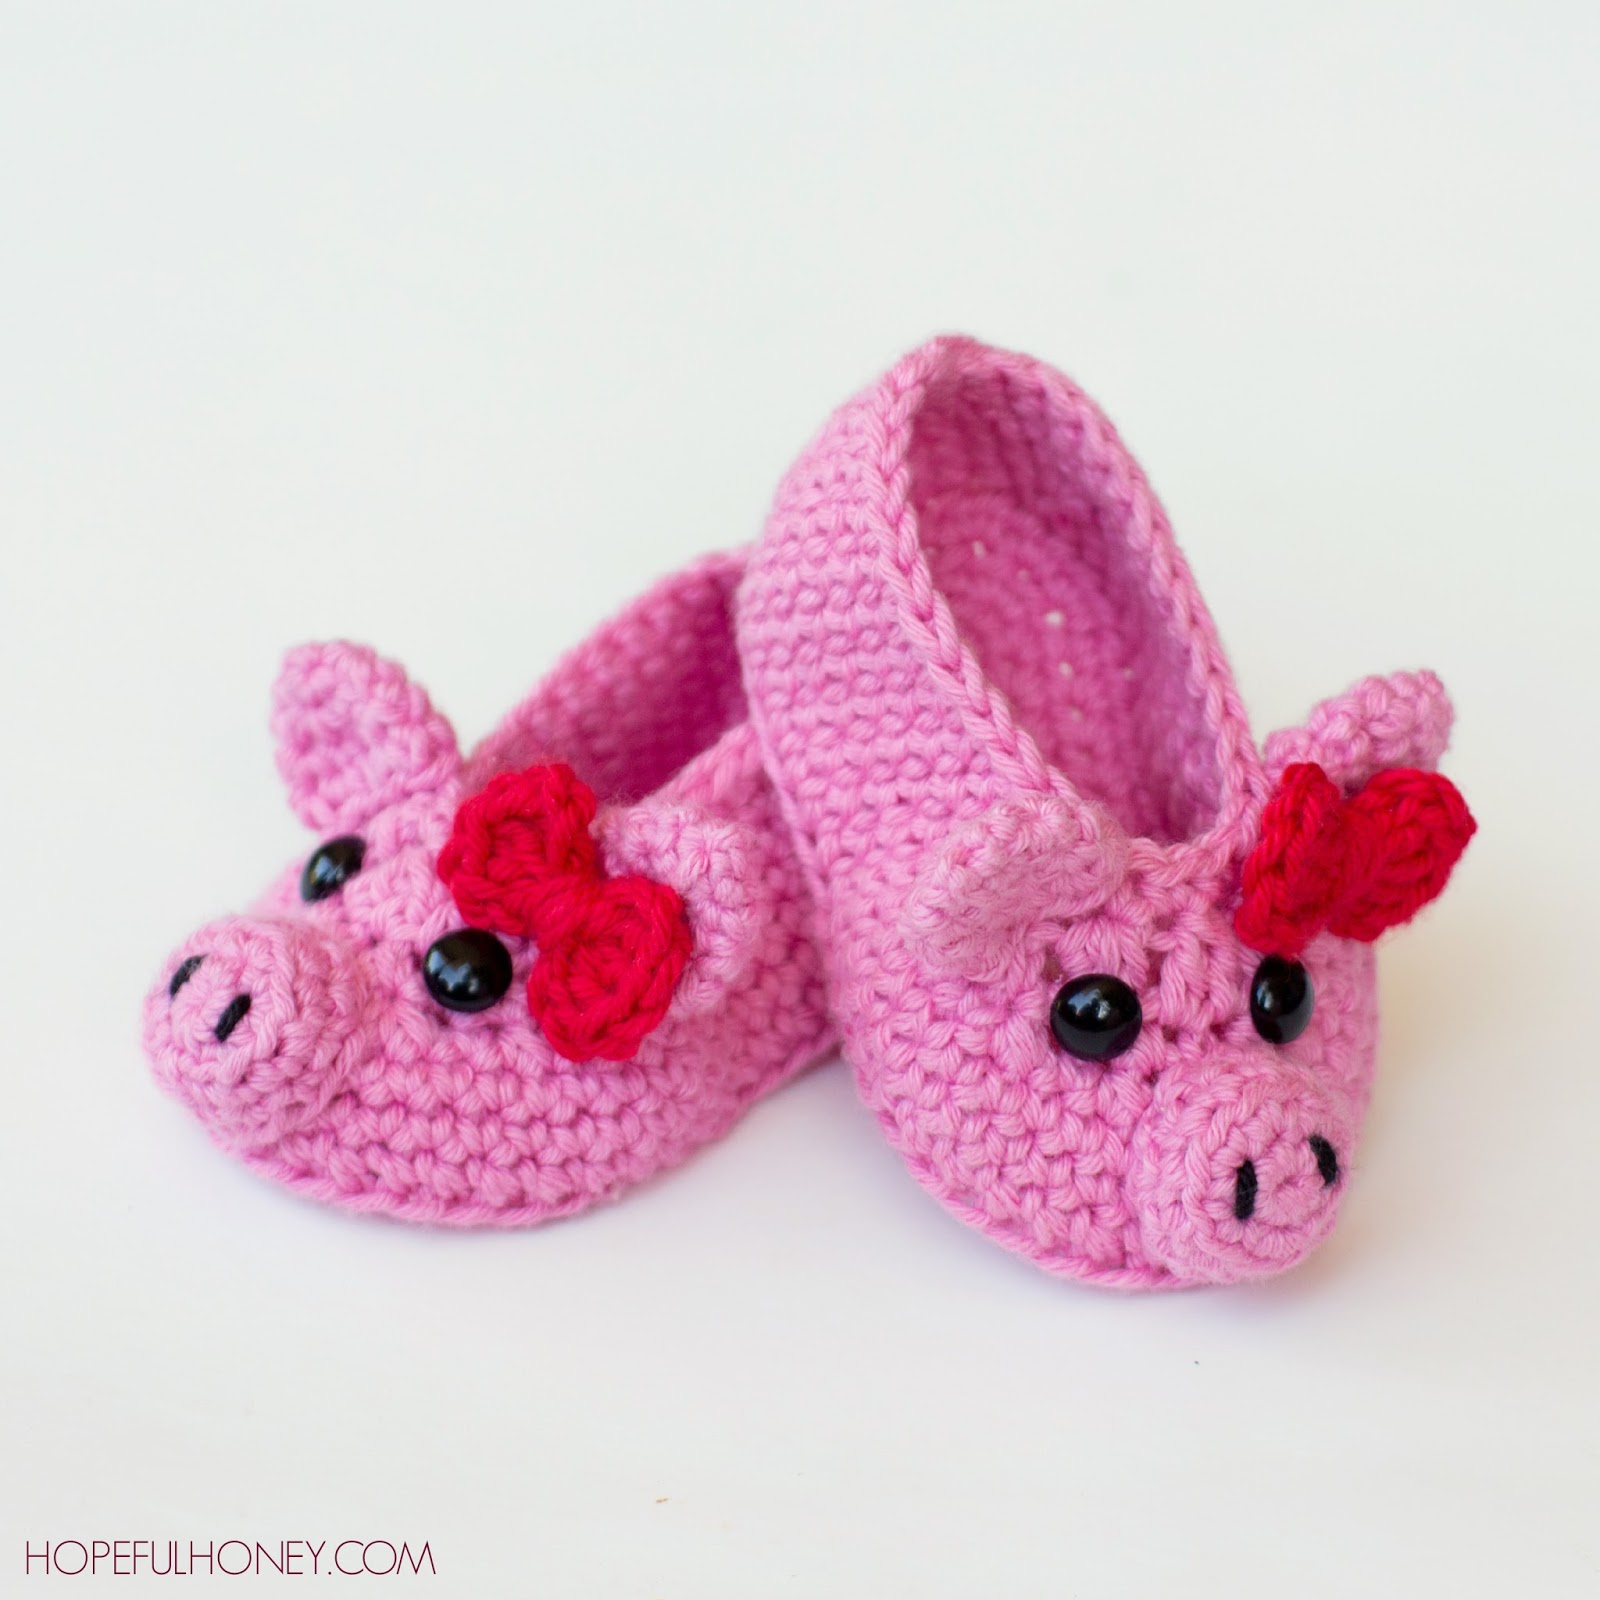 Free Crochet Baby Pig Hat Pattern : Hopeful Honey Craft, Crochet, Create: Pink Piggy Baby ...